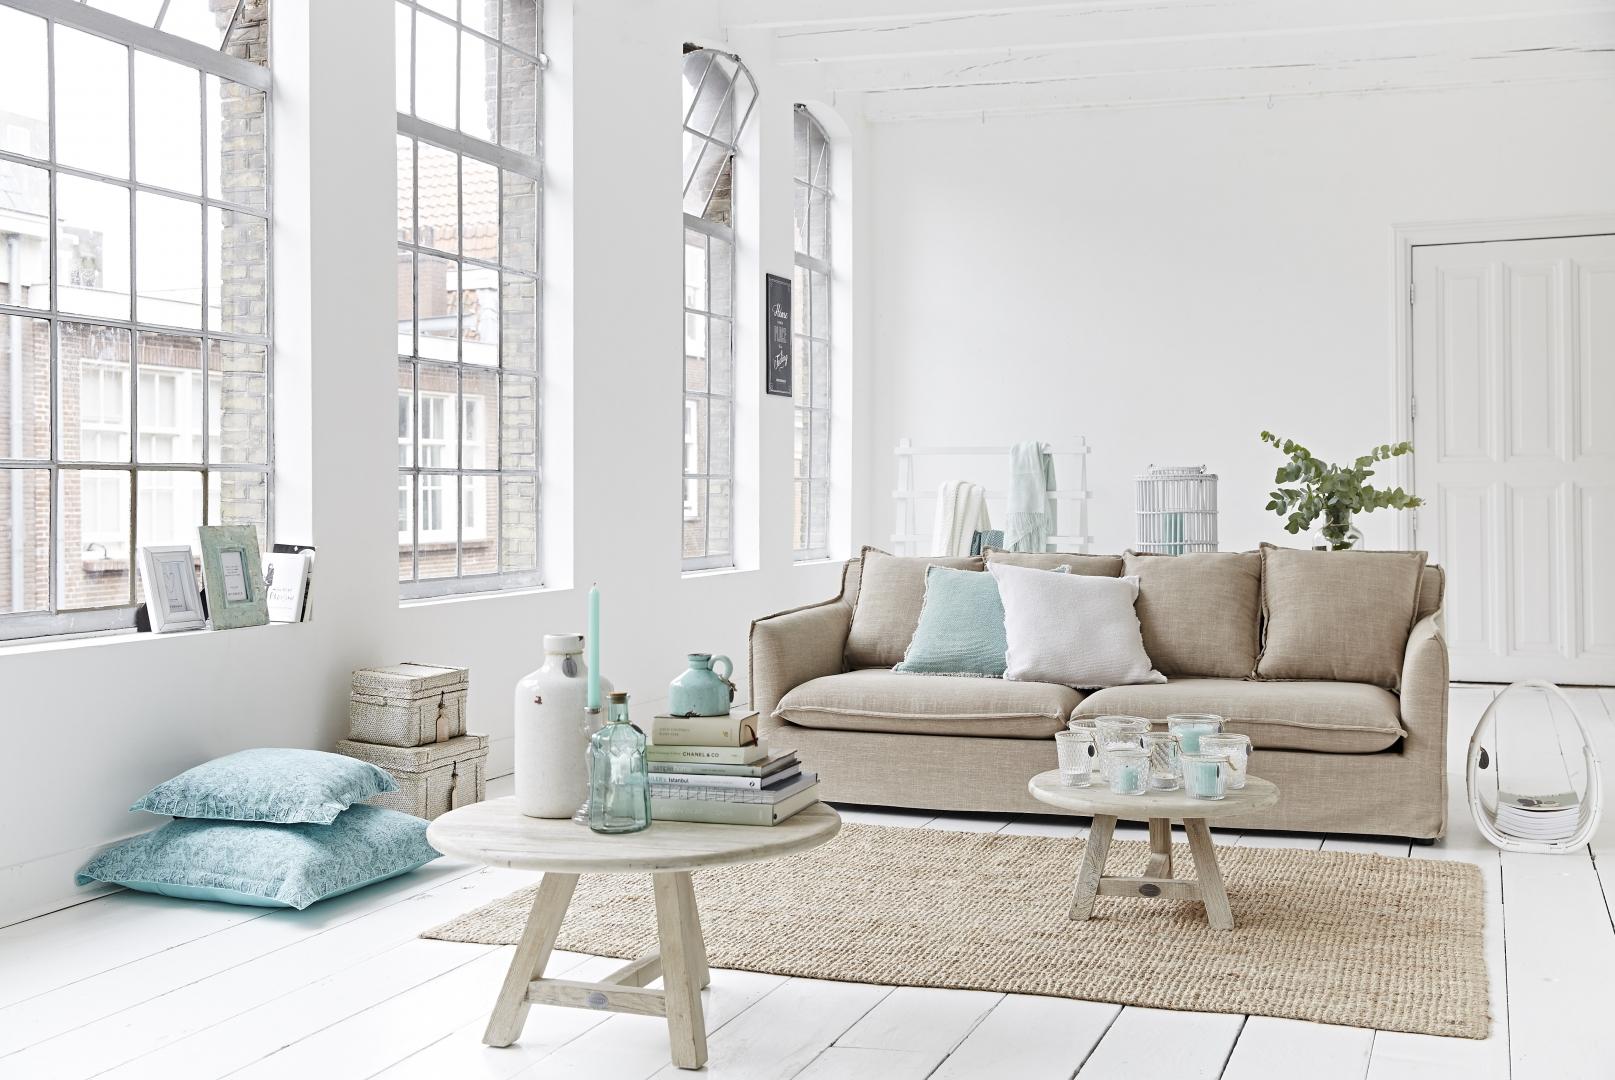 wonen seizoenen de lente in je interieur stijlvol styling woonblog. Black Bedroom Furniture Sets. Home Design Ideas